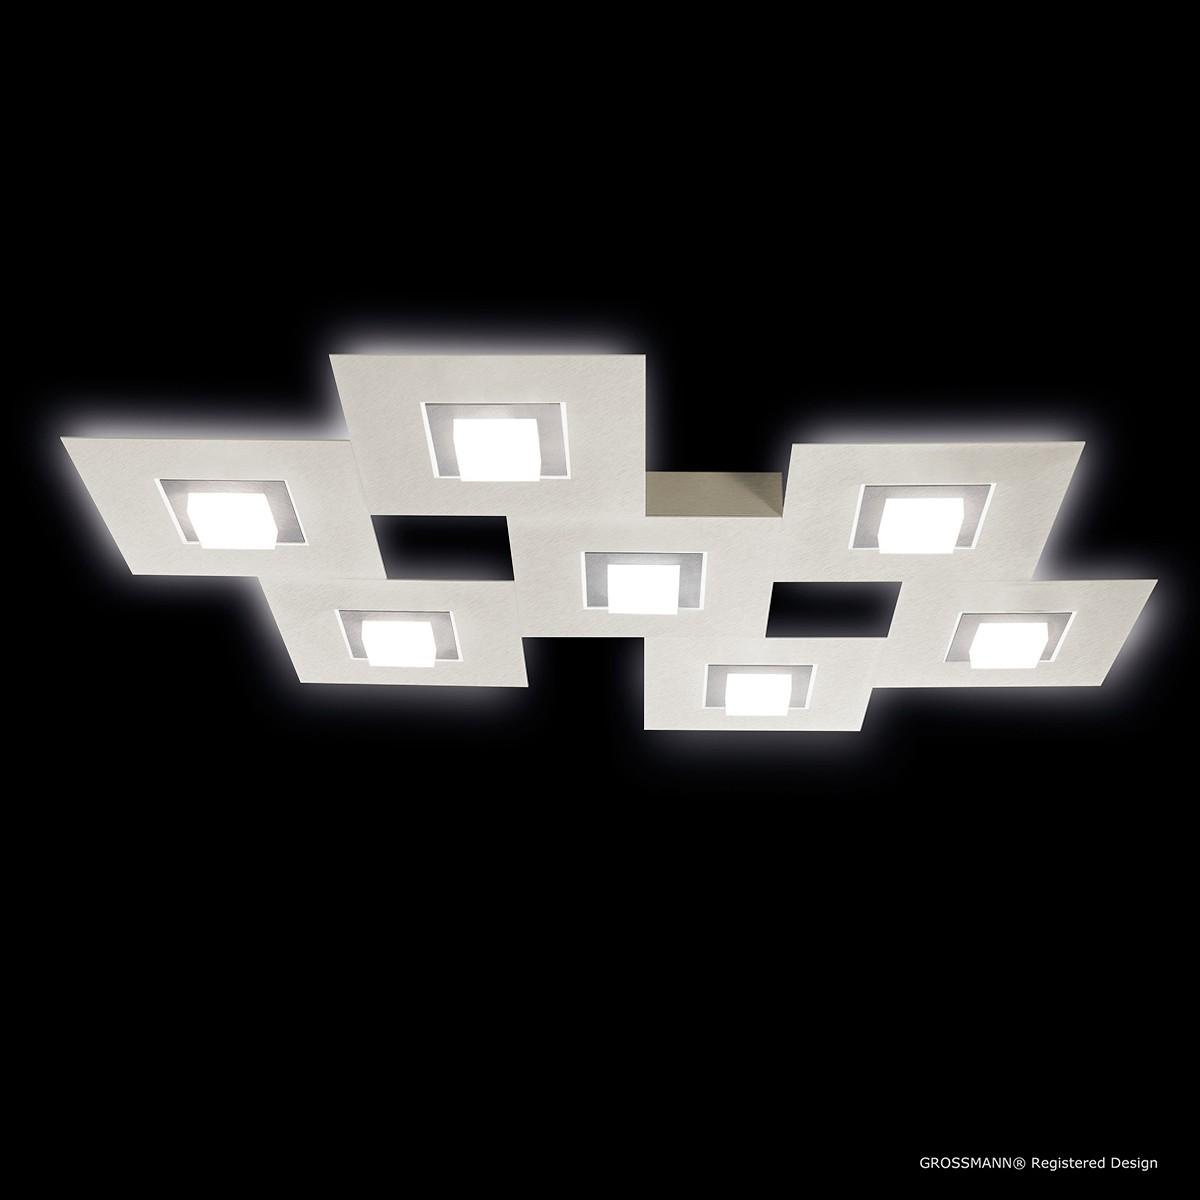 Grossmann Karree Wand- / Deckenleuchte, 7-flg., perlglanz, Rahmen: Titan